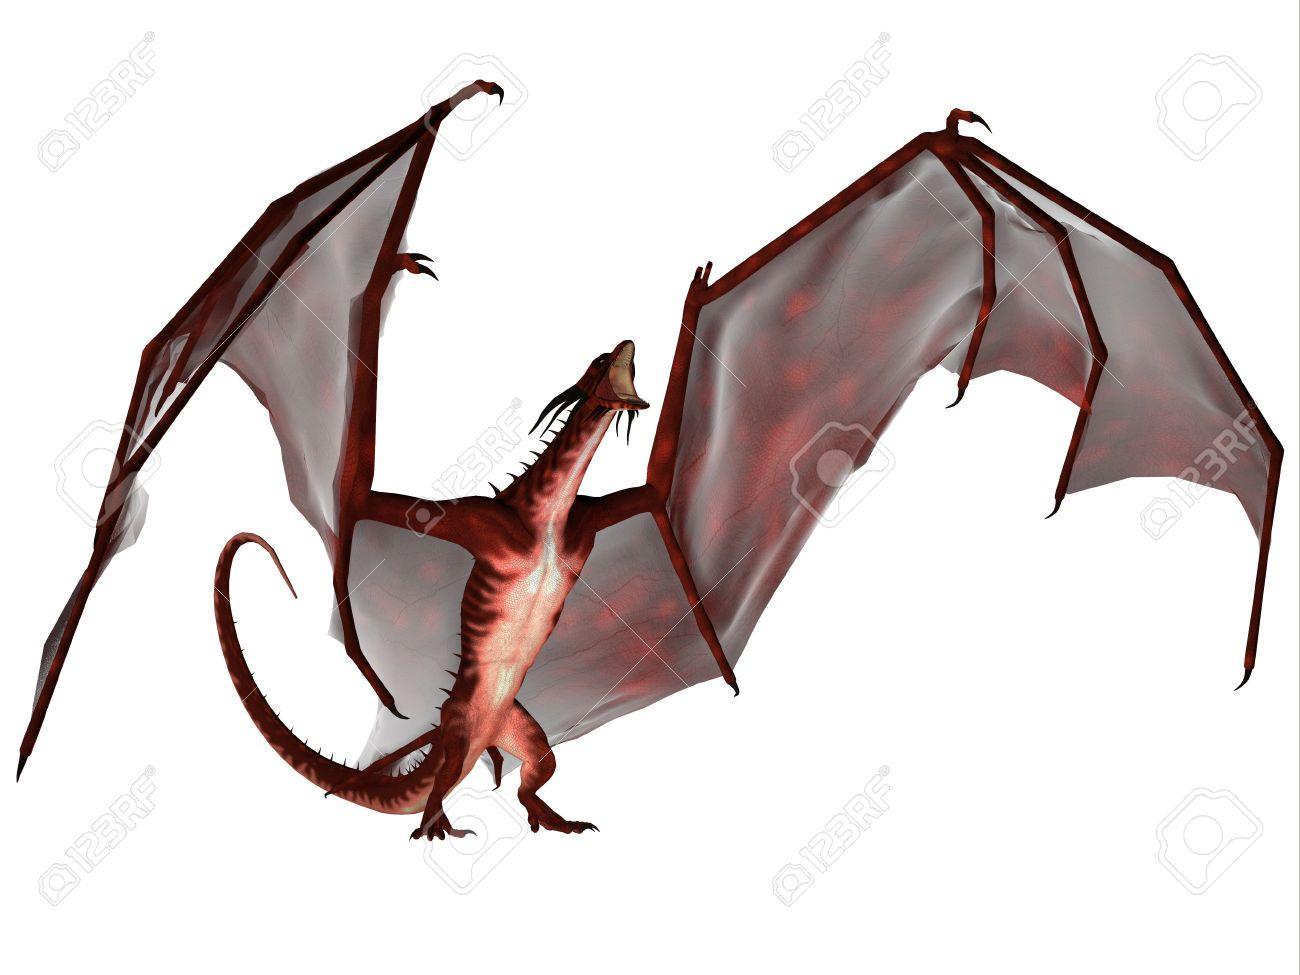 blood dragon scream a creature of myth and fantasy the dragon